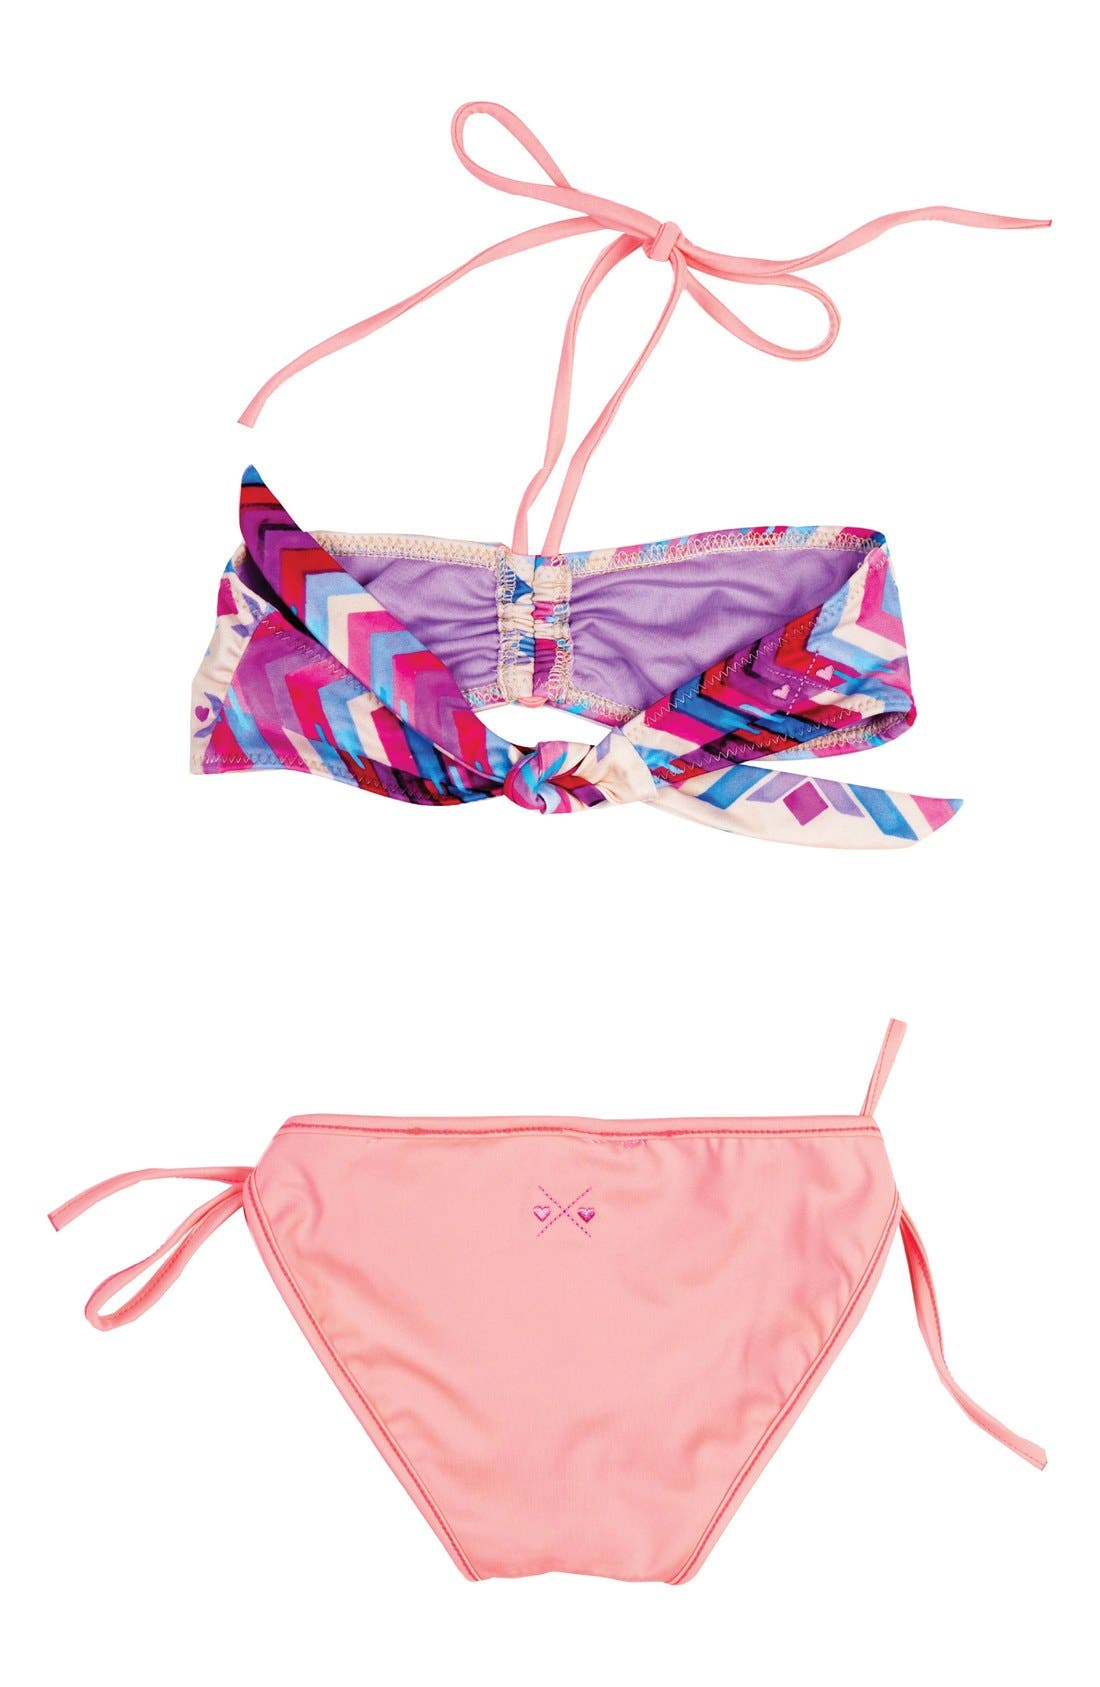 Endless Summer Two-Piece Reversible Bandeau Swimsuit,                             Alternate thumbnail 3, color,                             100